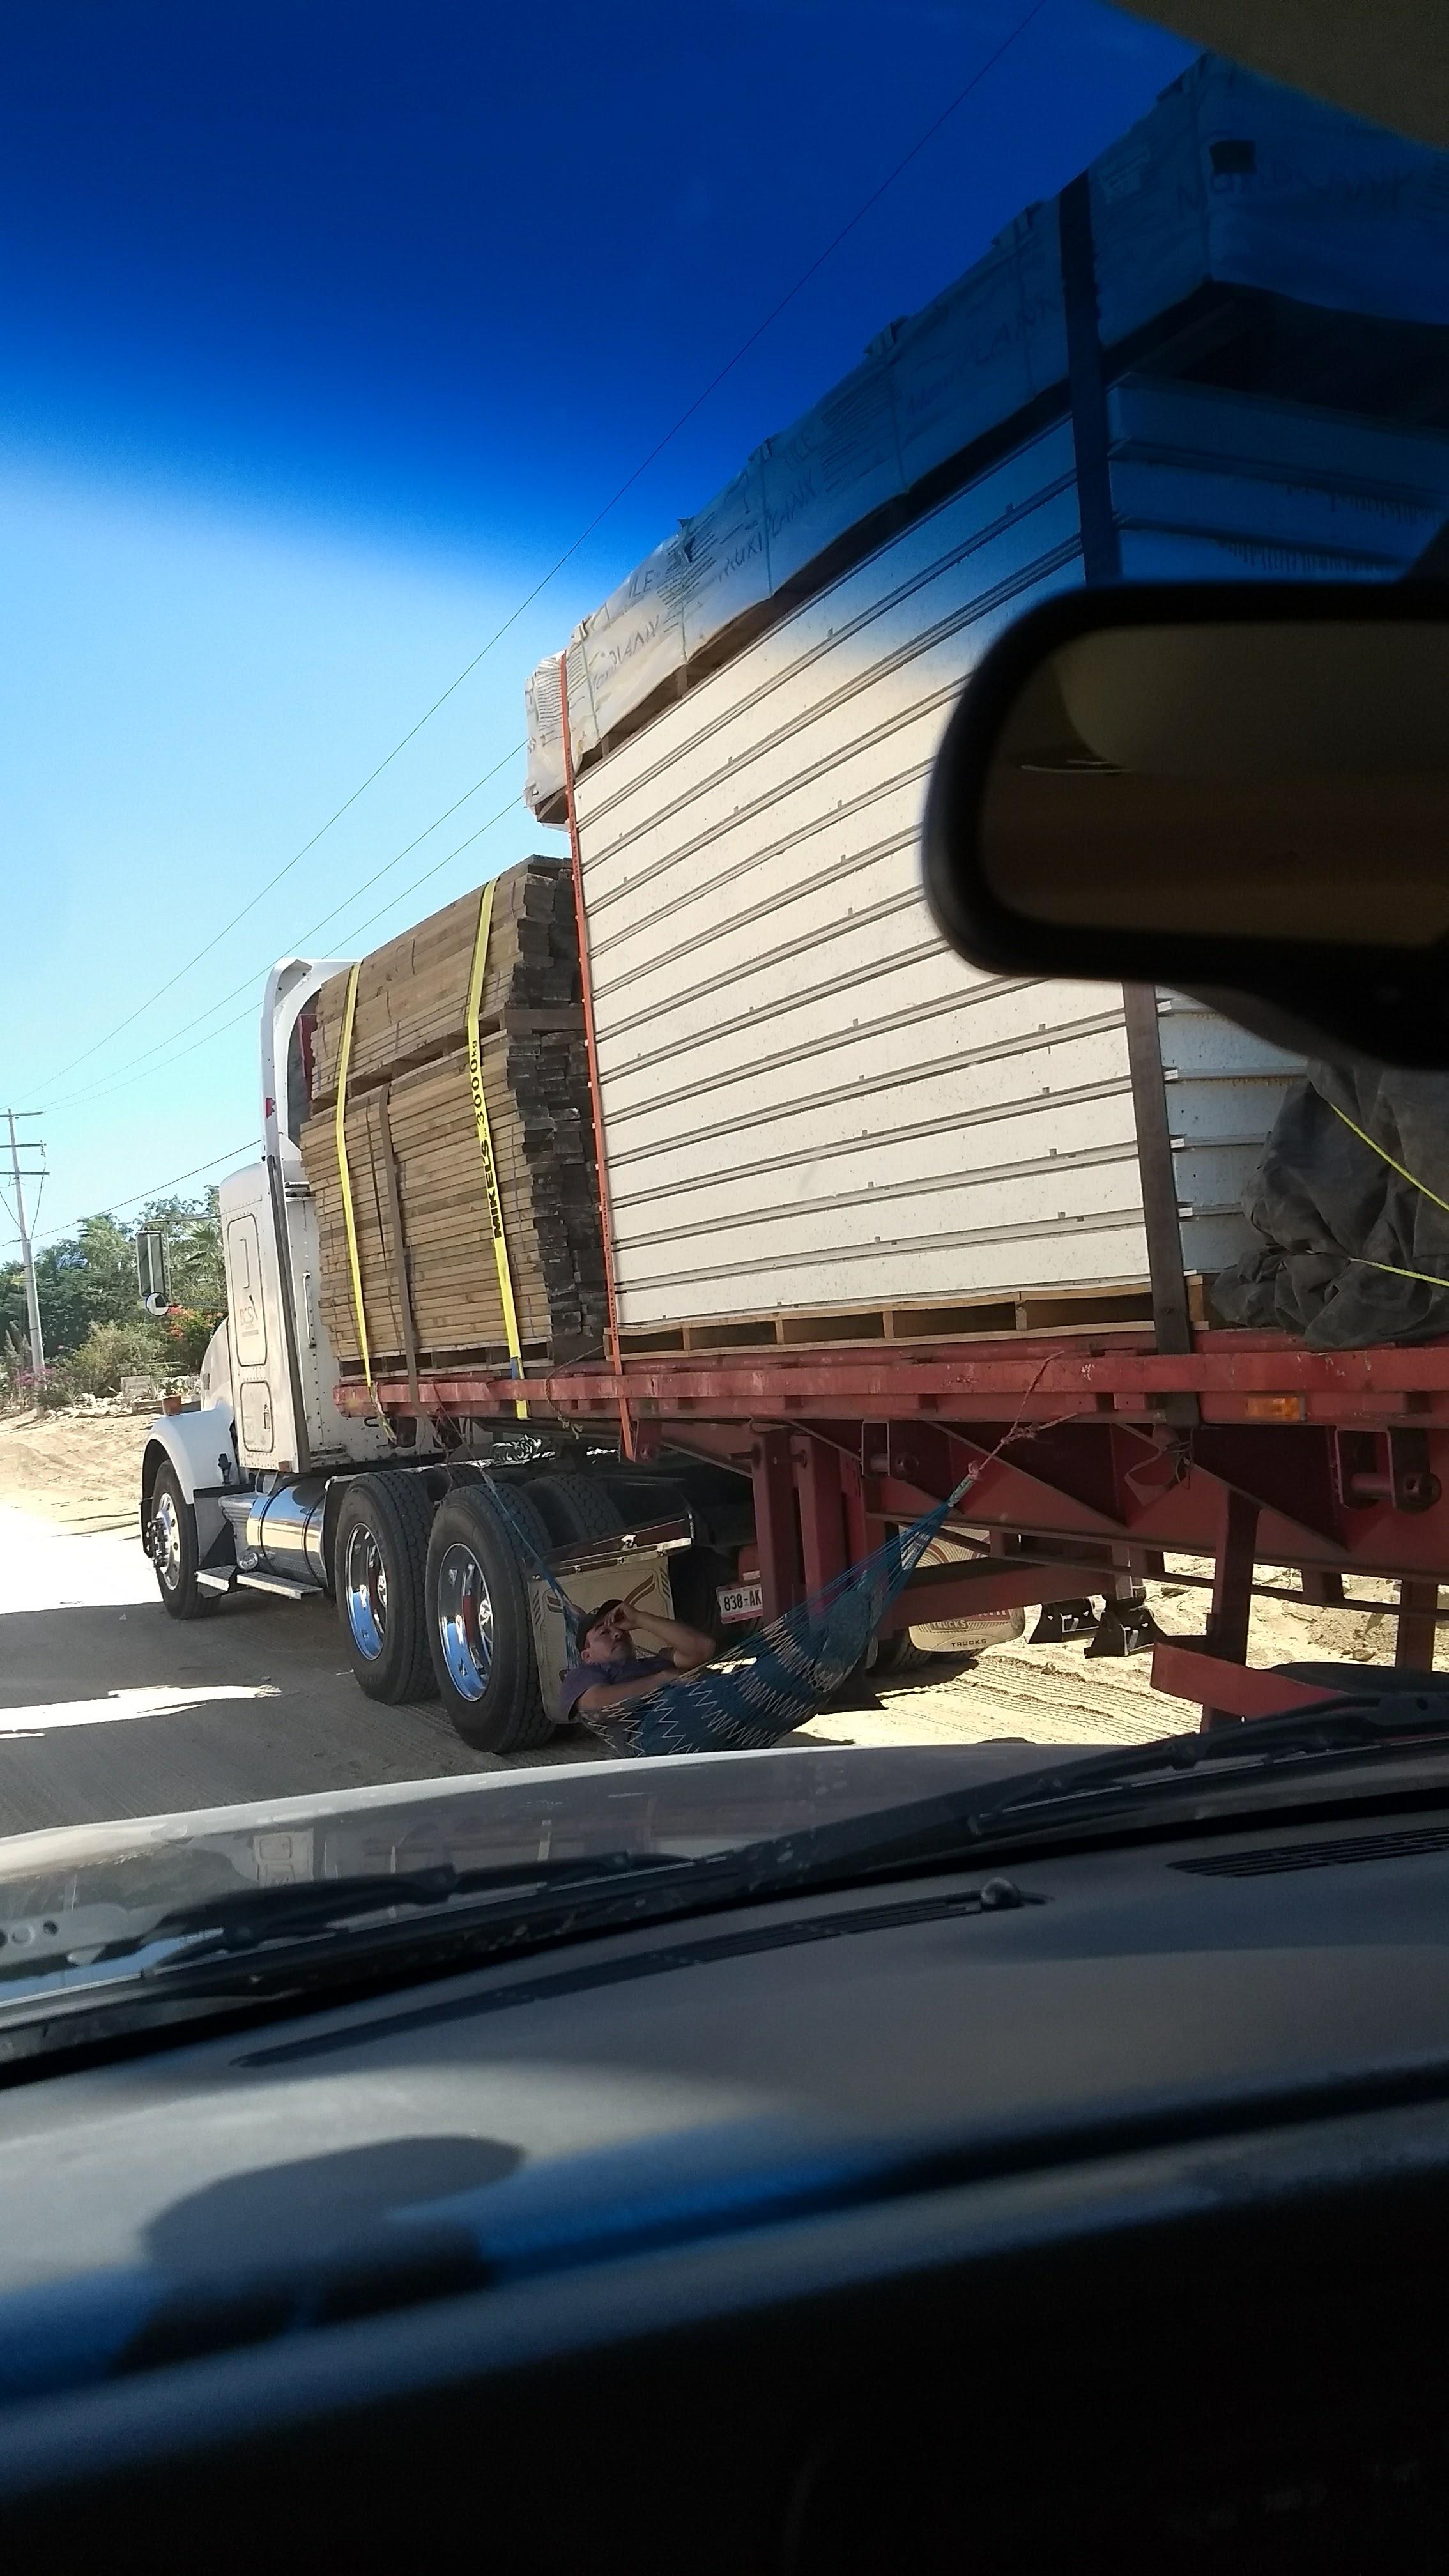 50% less Trucking